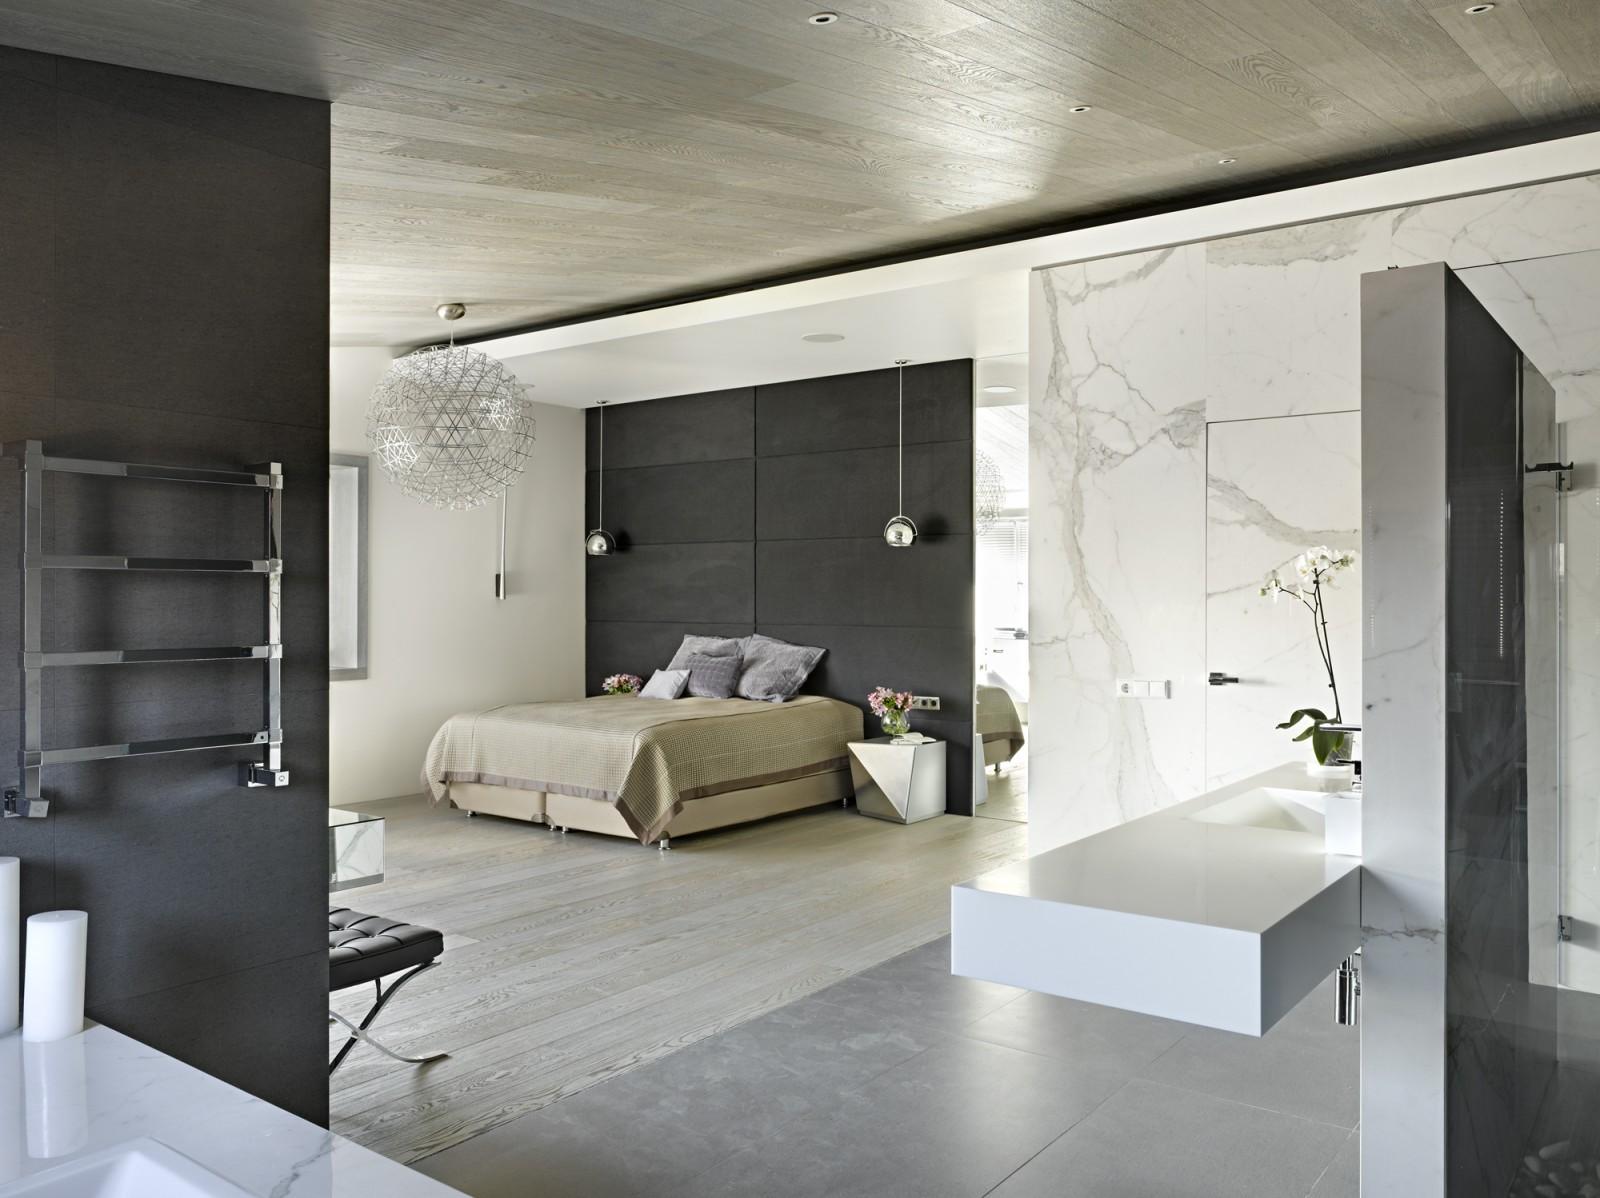 Nice villa interior by architectural Bureau of Alexandra Fedorova - 14